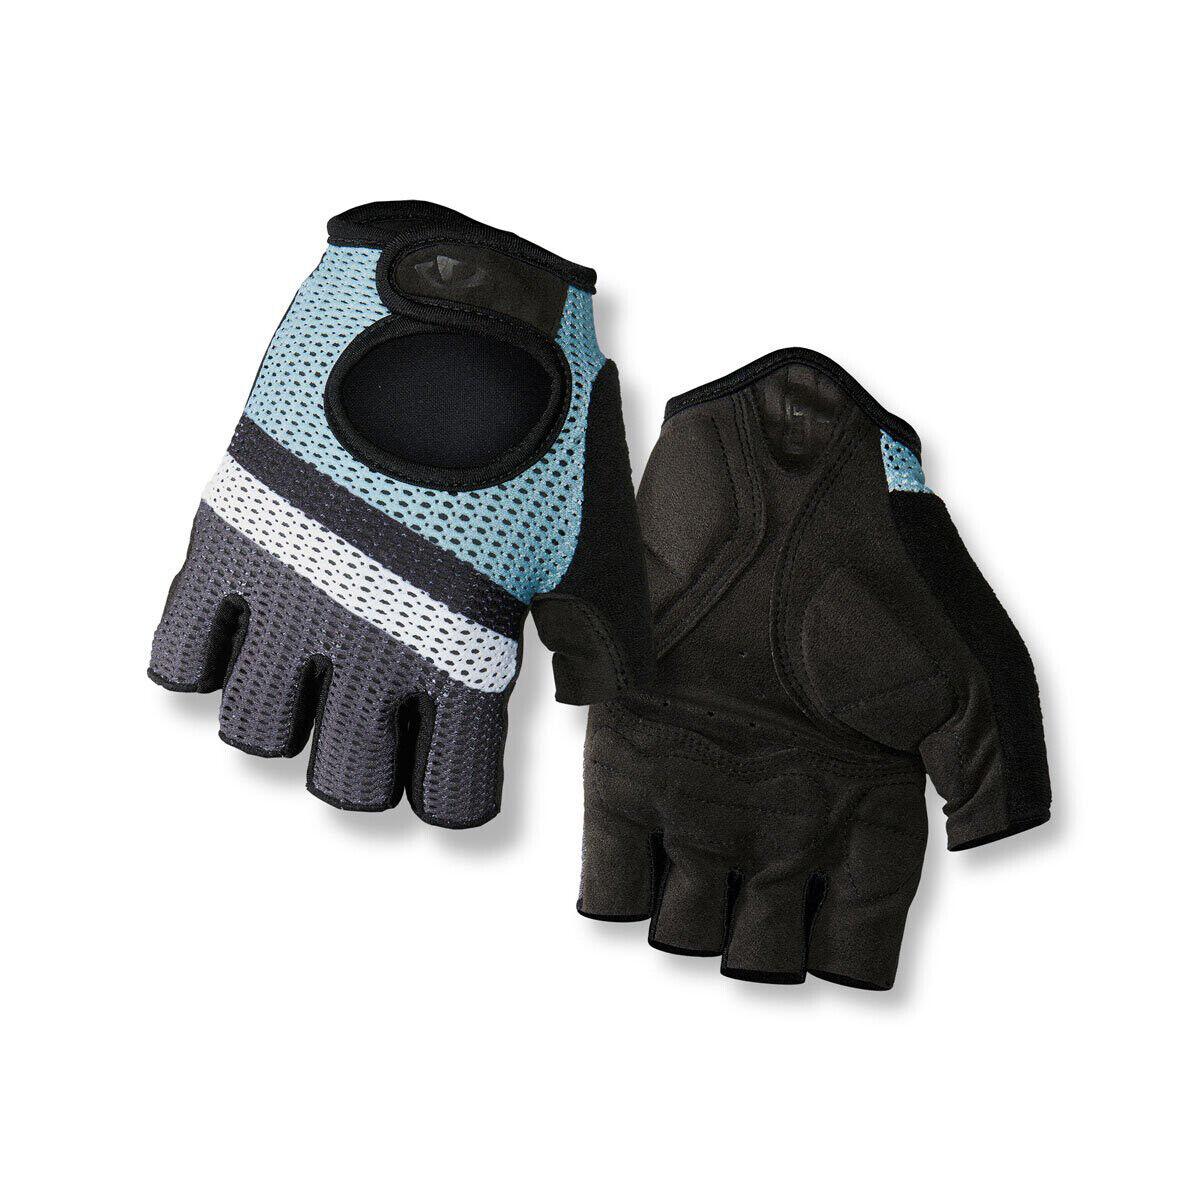 Giro Radhandschuhe Handschuh SIV blau atmungsaktiv flexibel schützend gestreift